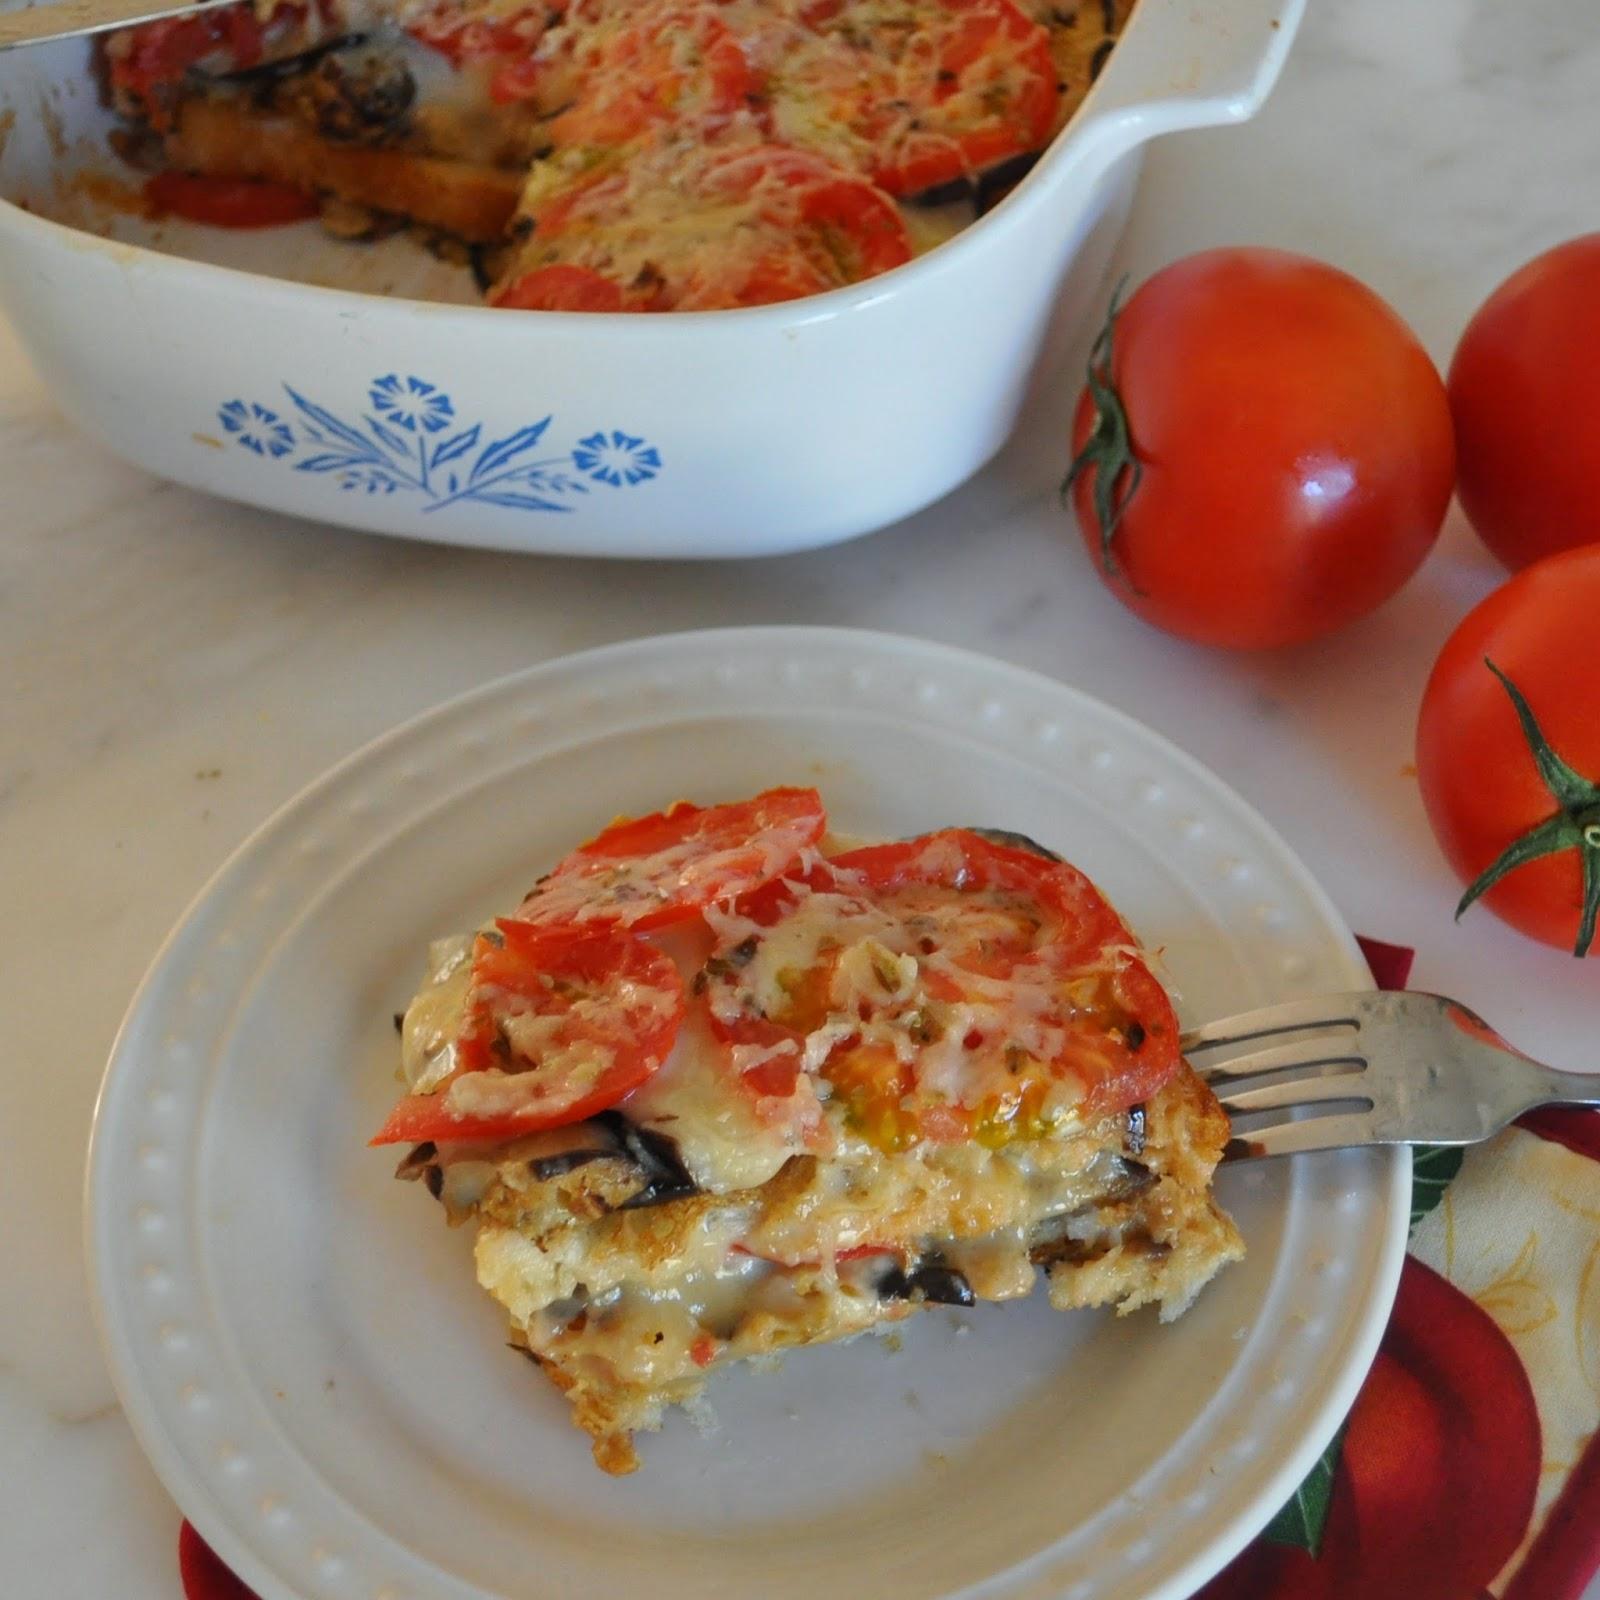 ... Manuela: Light and Fresh Eggplant Parmesan - Melanzane alla Parmigiana